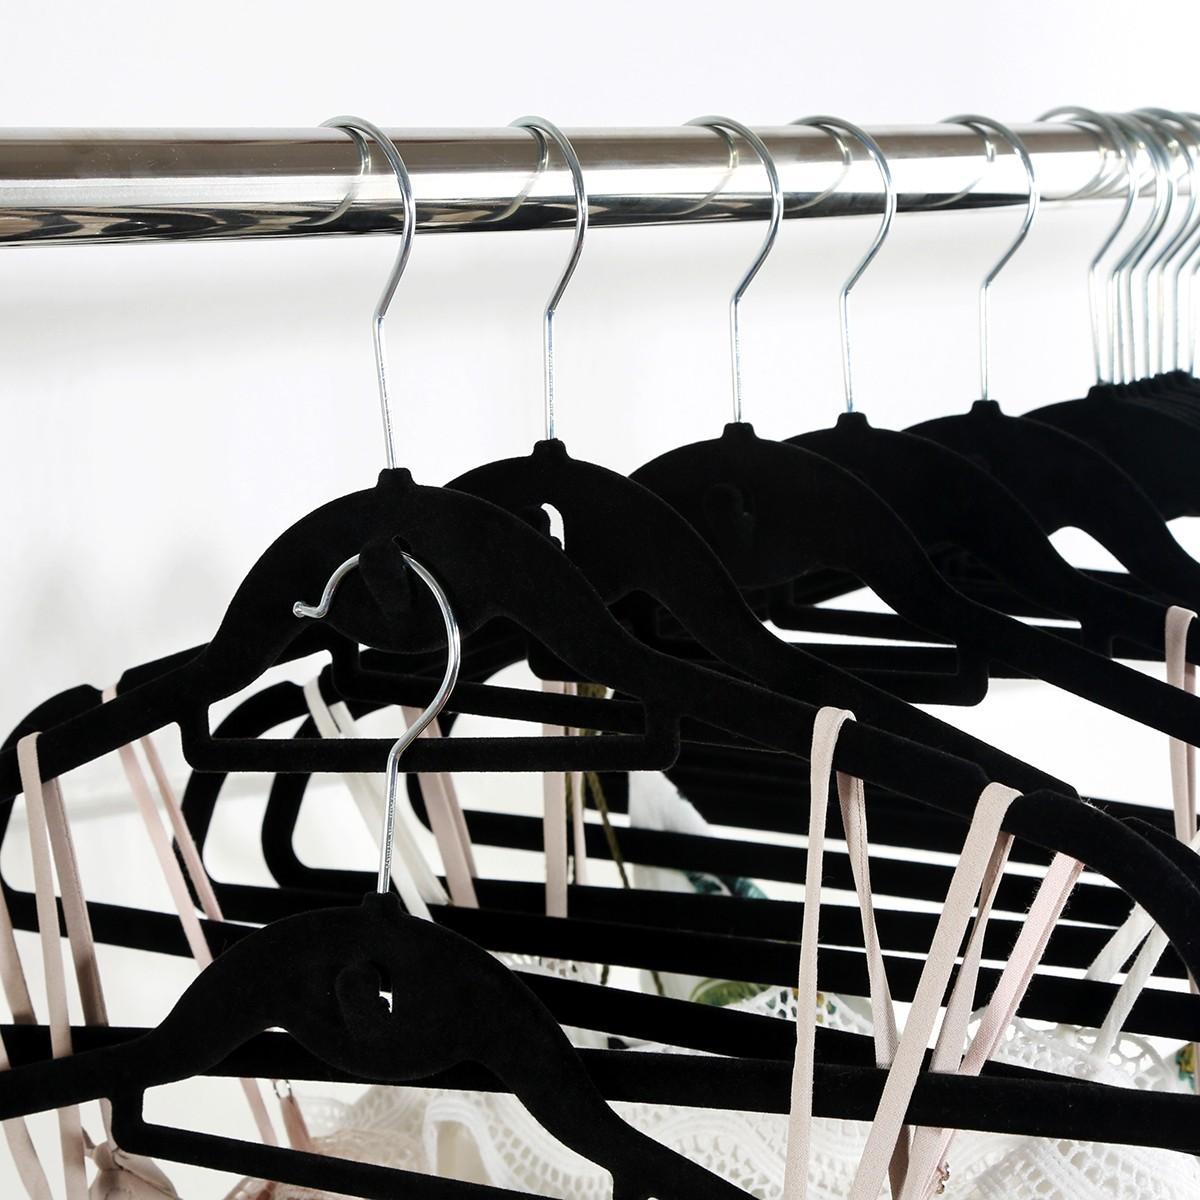 120pcs Coat Hangers Clothes Pants Closet Velvet Nonslip Space Saving Thin Black